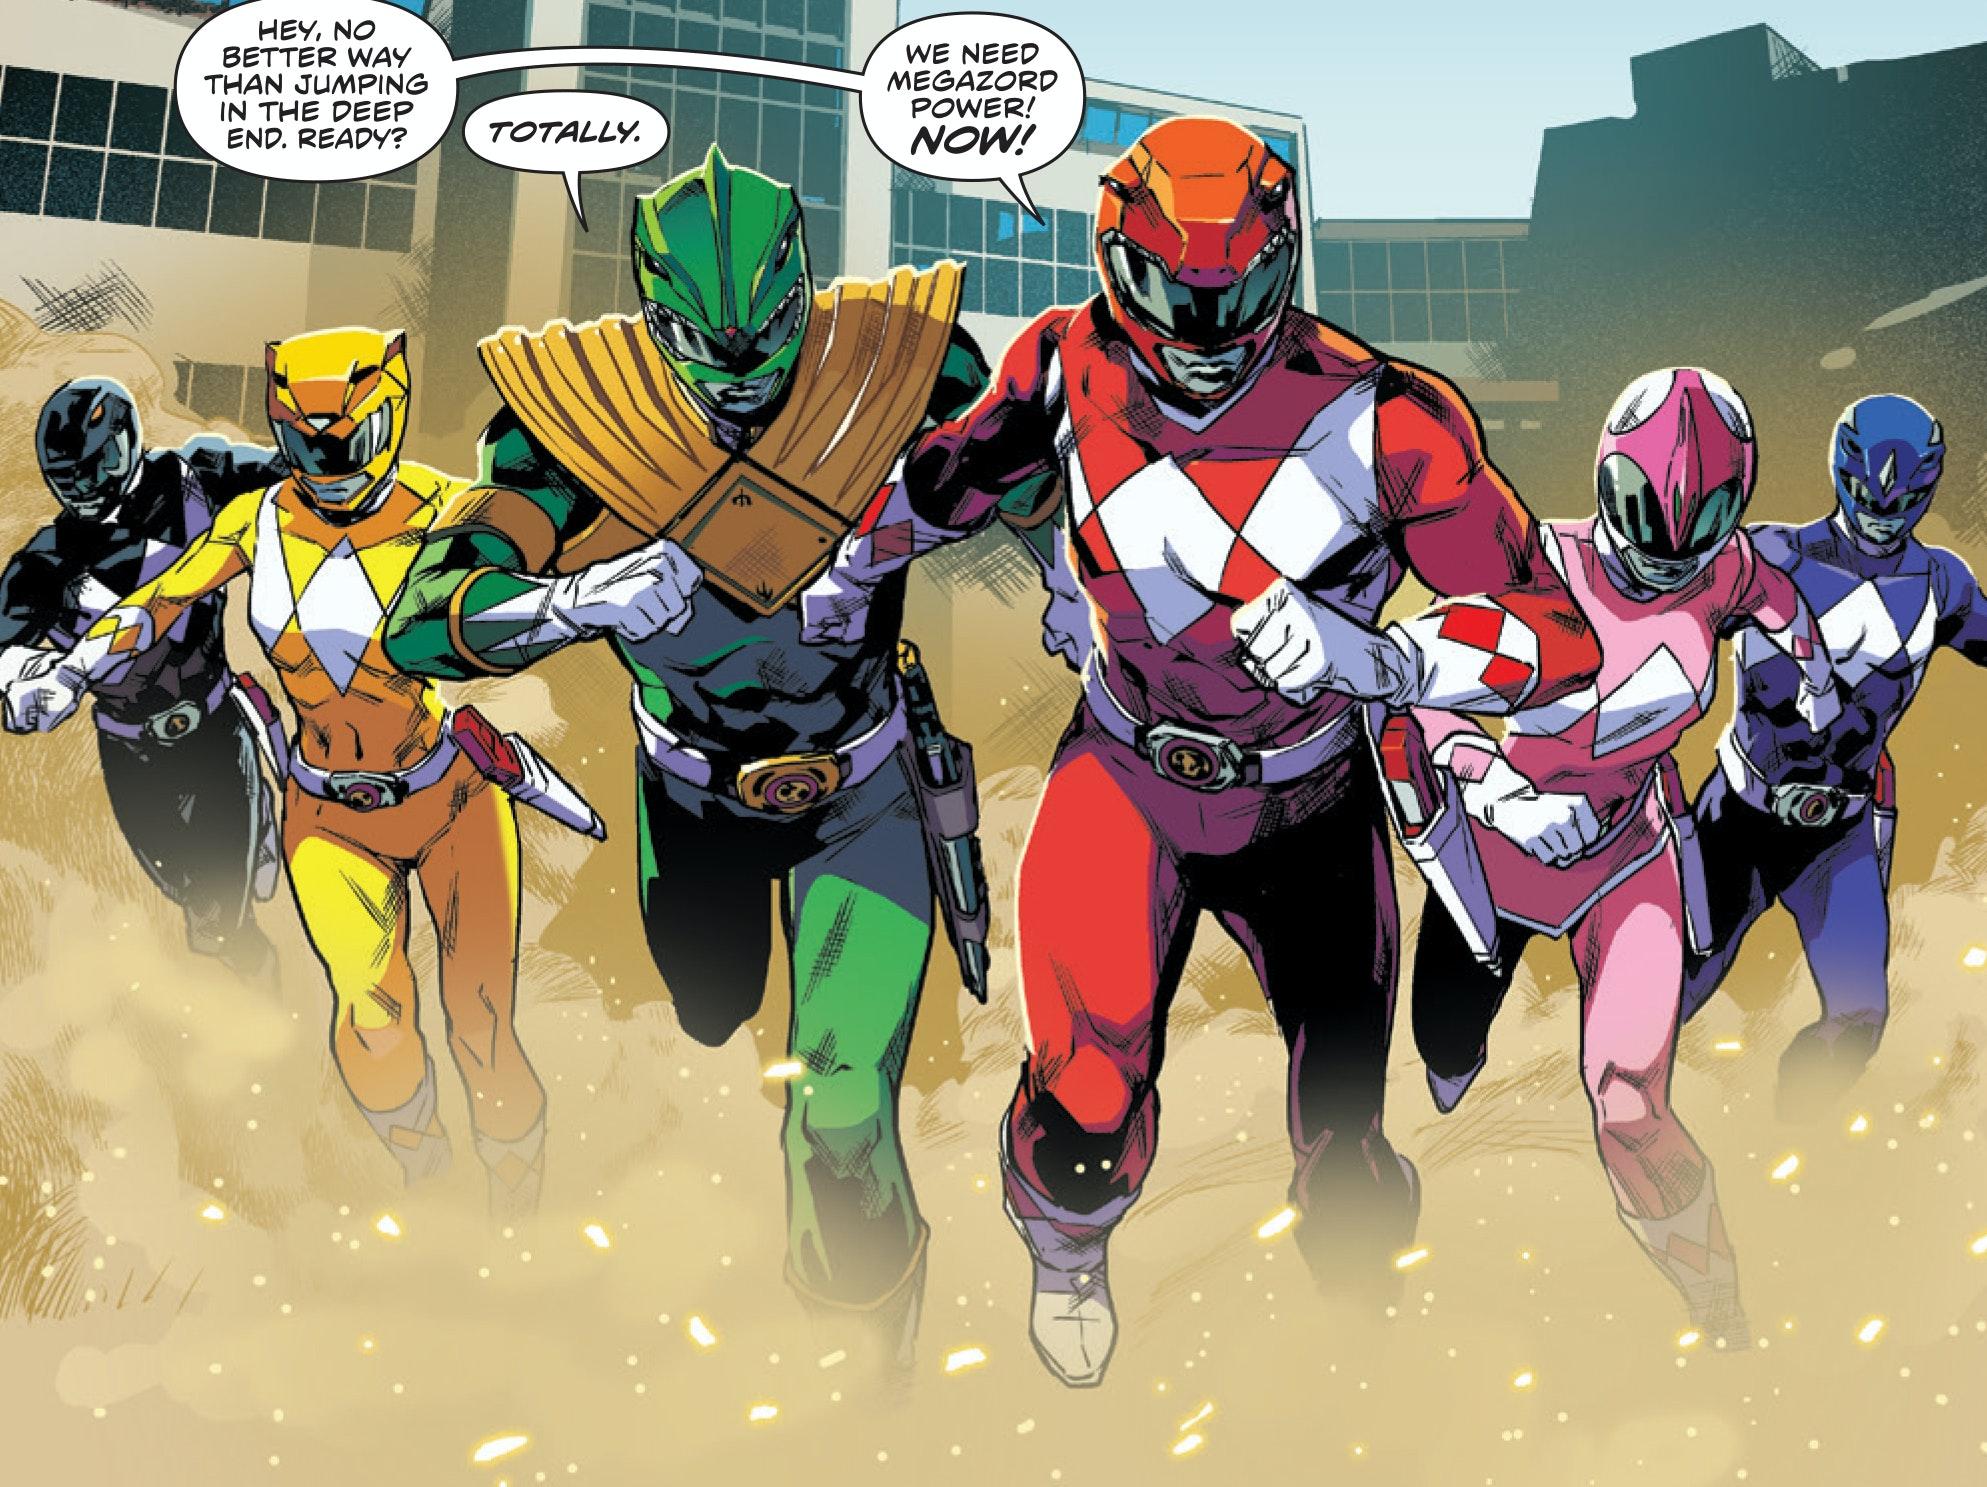 Anti-Nostalgic 'Power Rangers' Was One of 2016's Best Comics